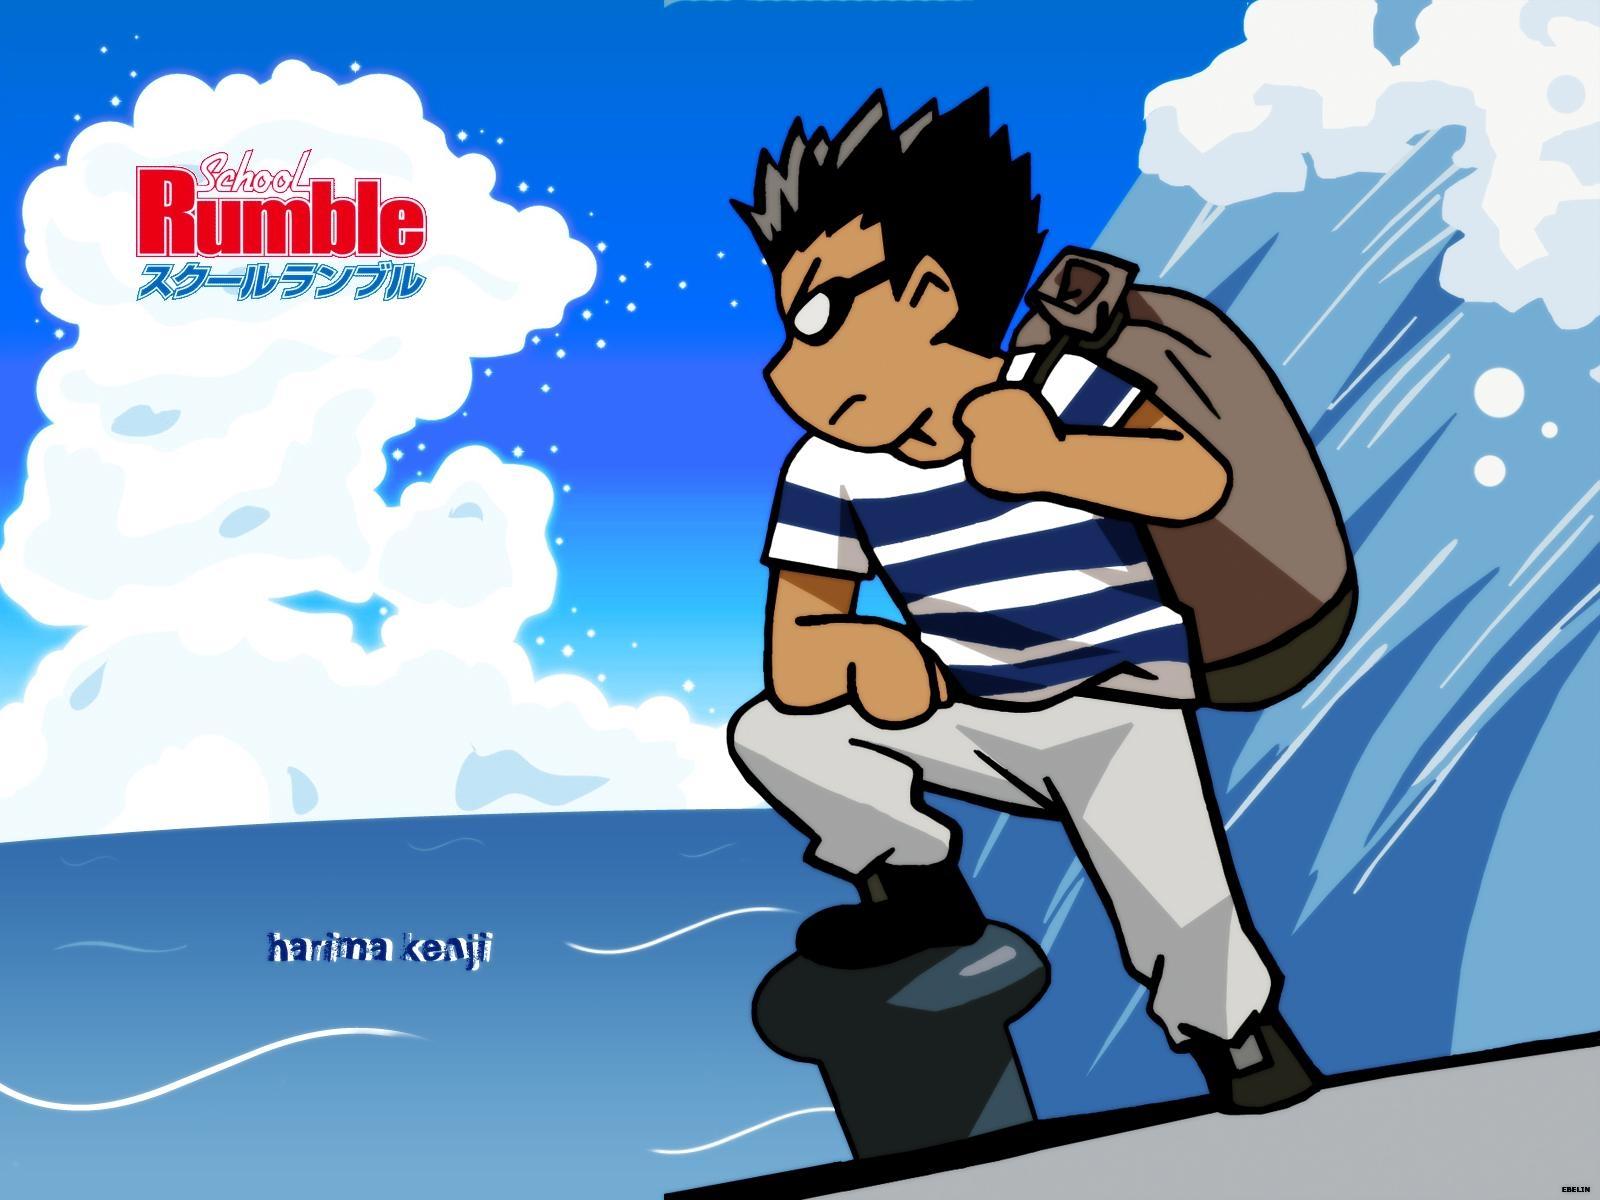 harima_kenji school_rumble